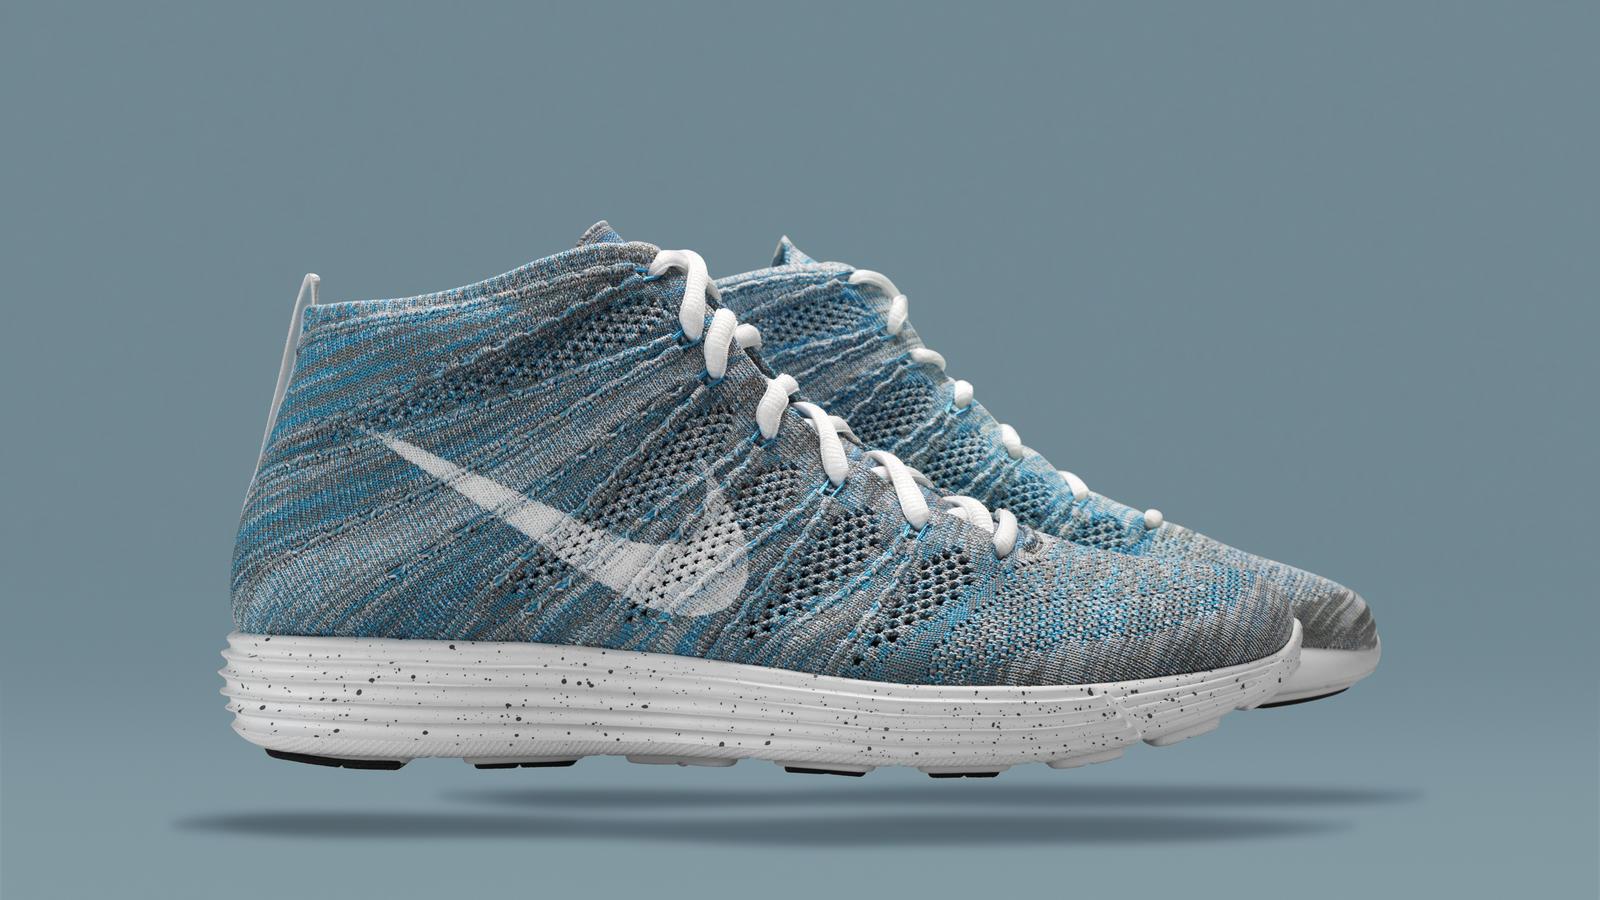 Nike Sportswear takes Nike Flyknit to new heights - Nike News 7ba15d378